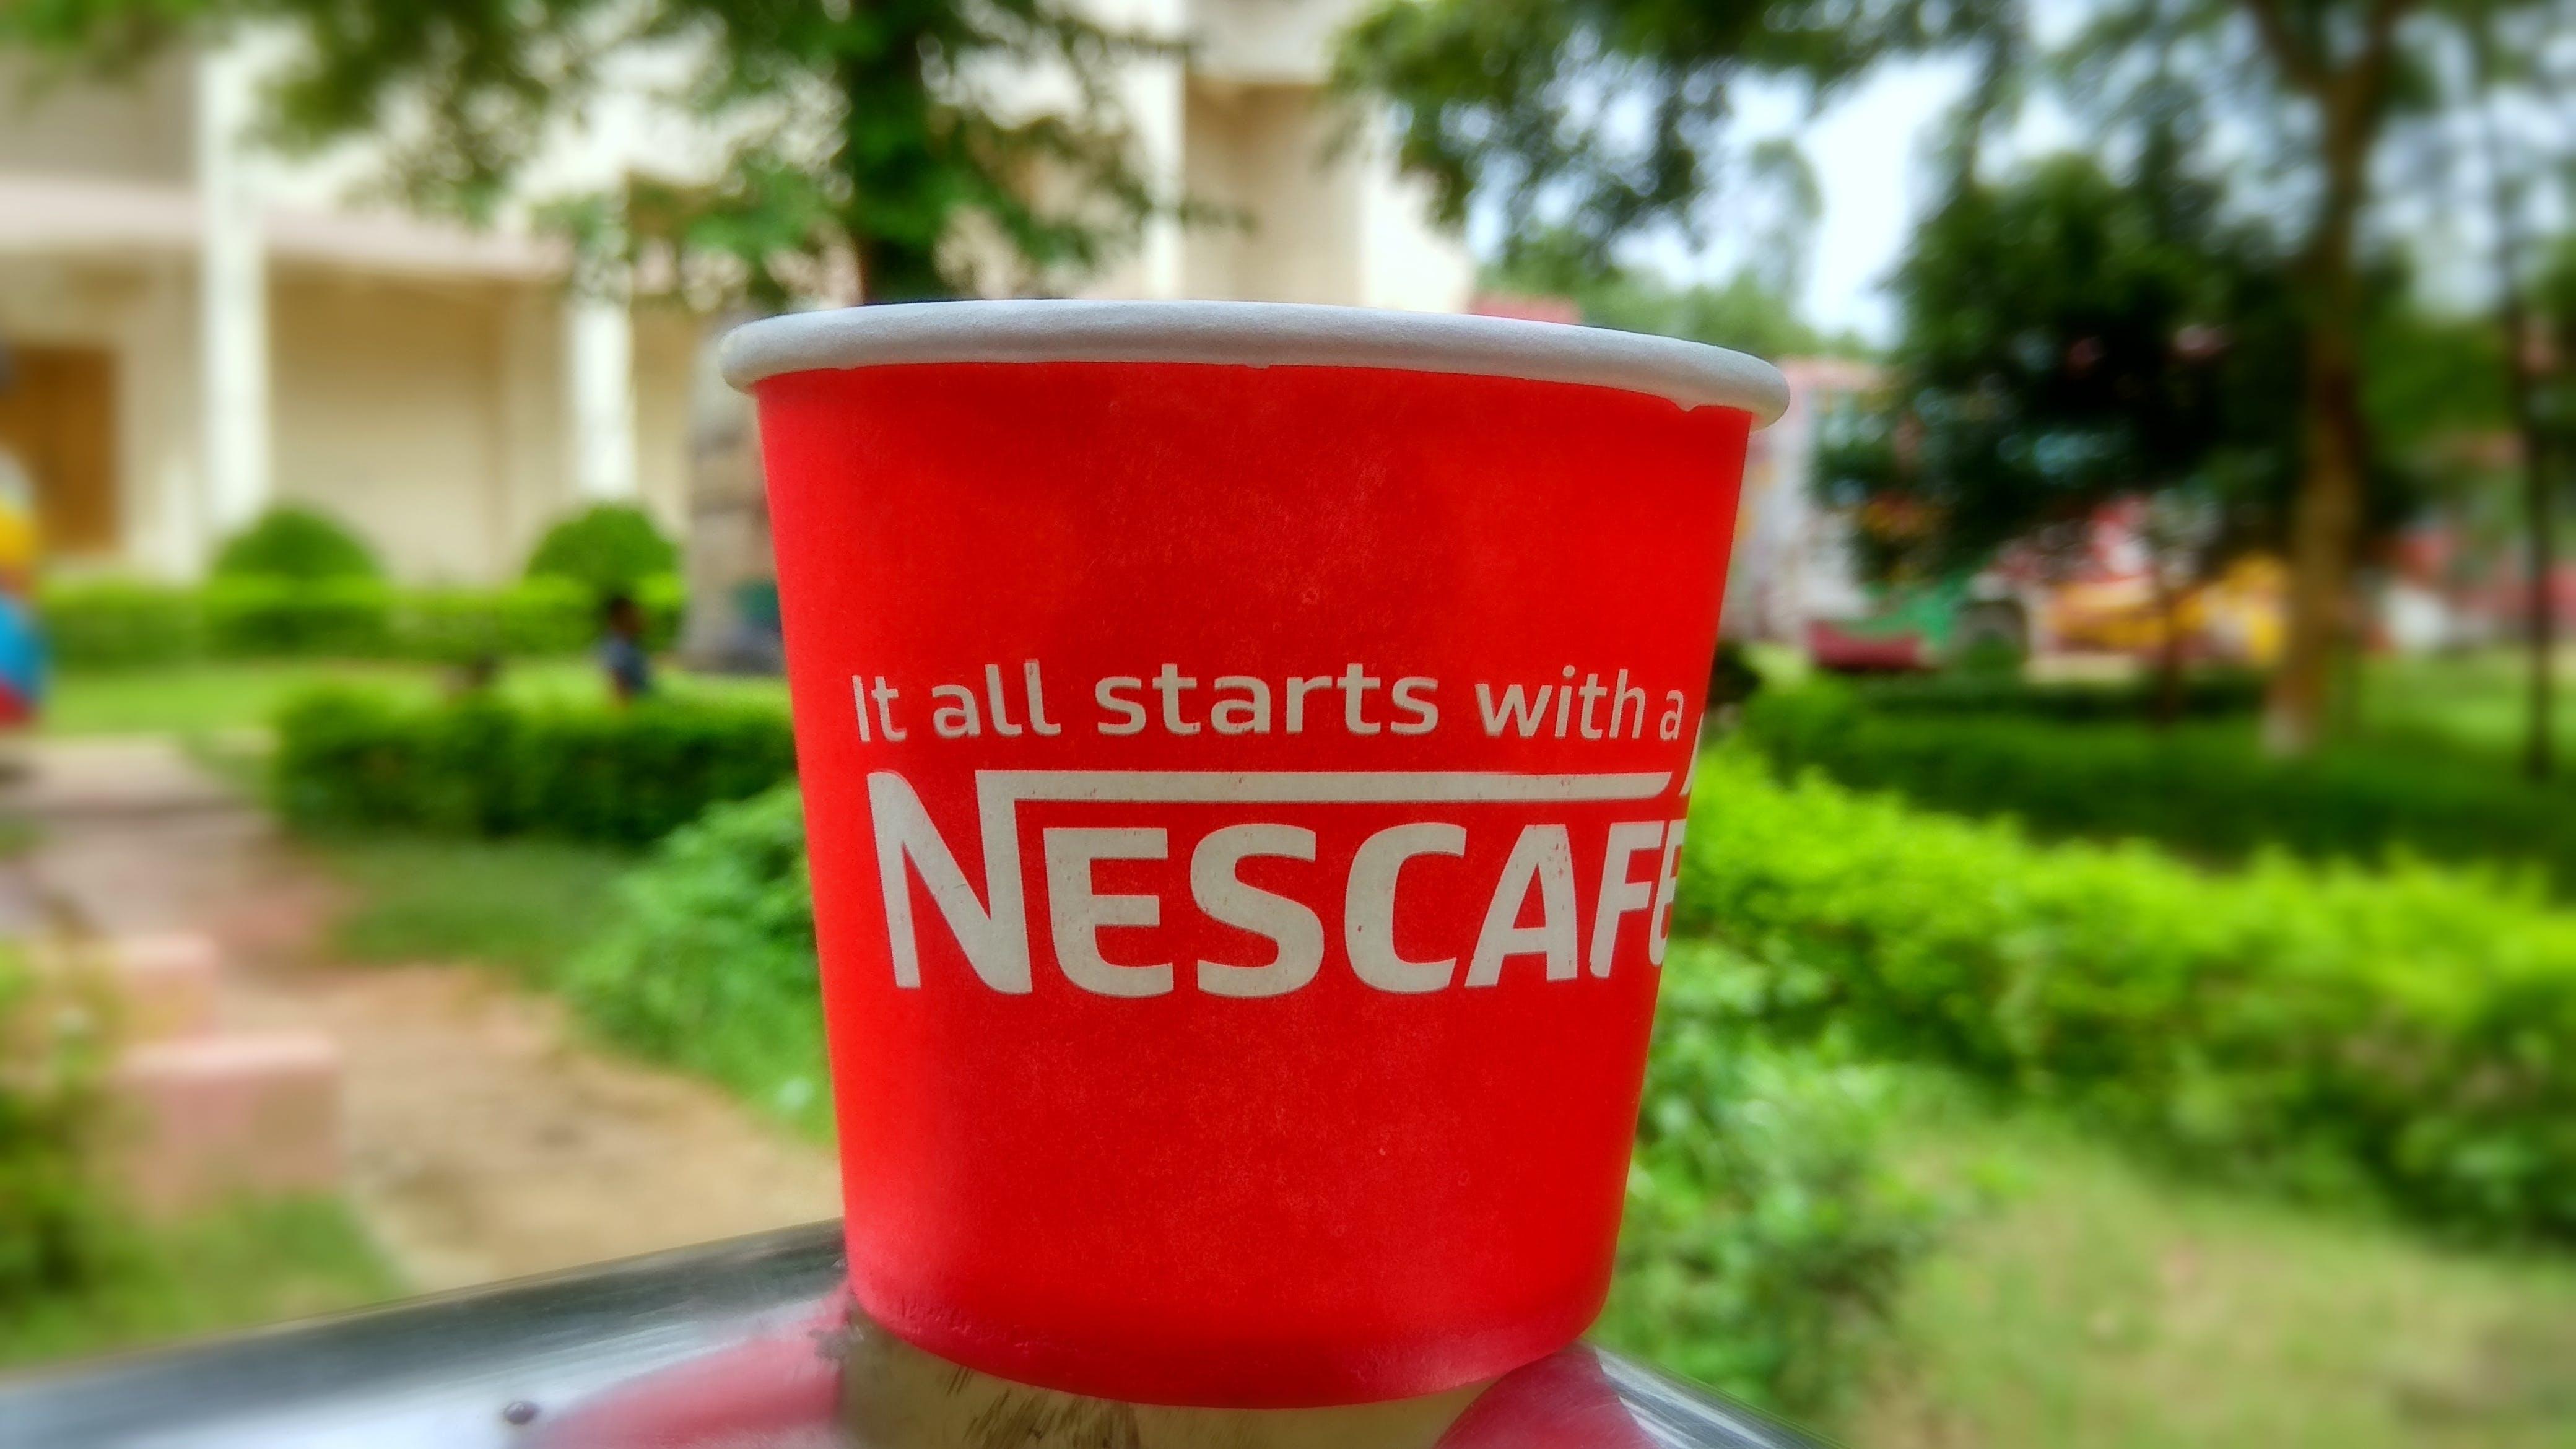 Free stock photo of #Coffee #Nescafe #Bokeh #Nature #green #drinks